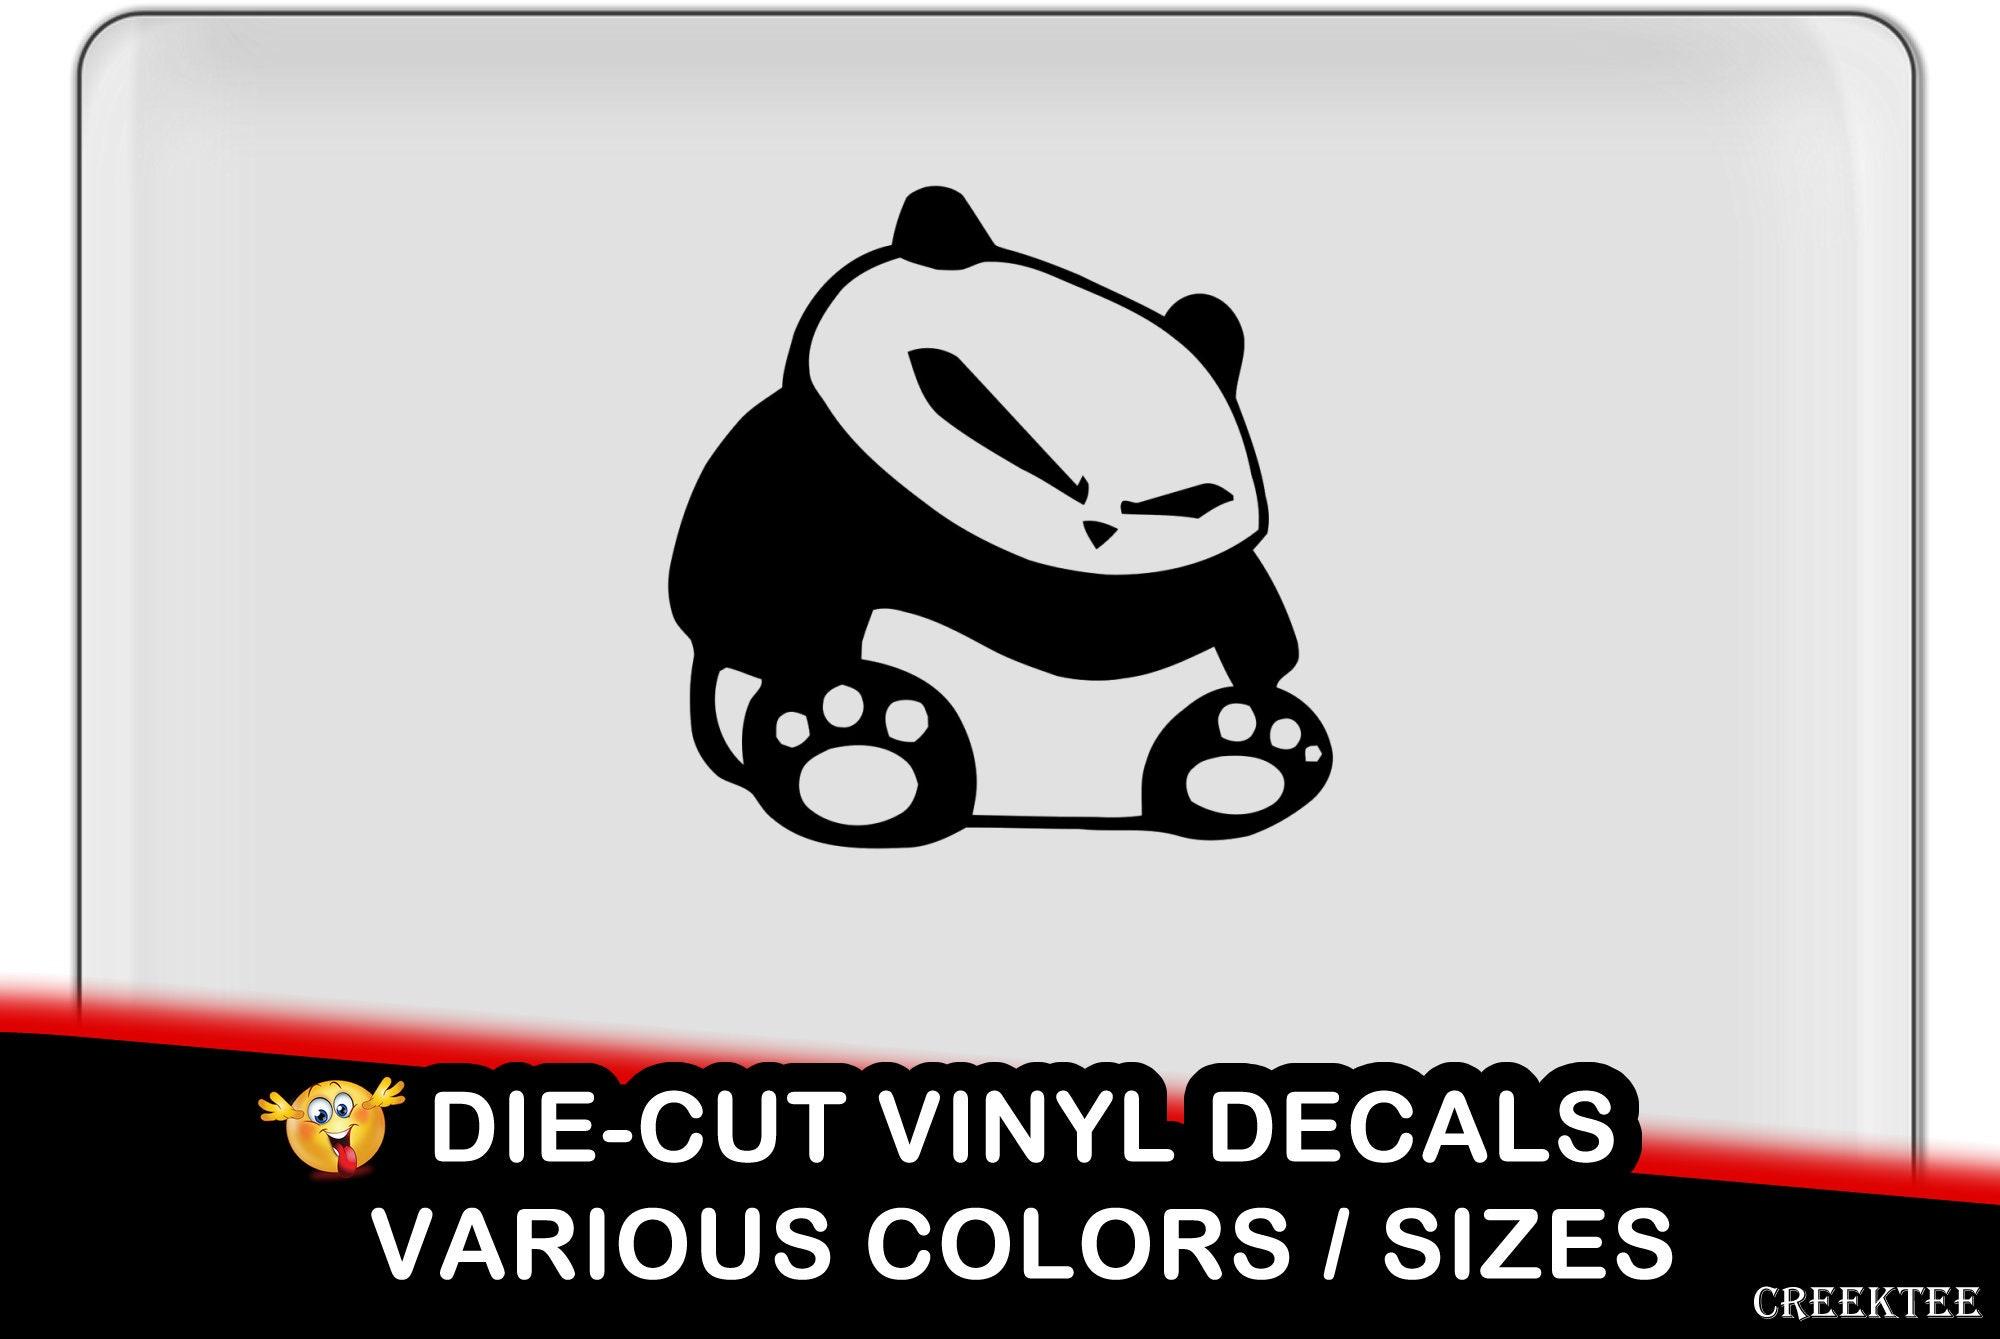 Panda jdm Vinyl Decal - fun vinyl decal in various colors